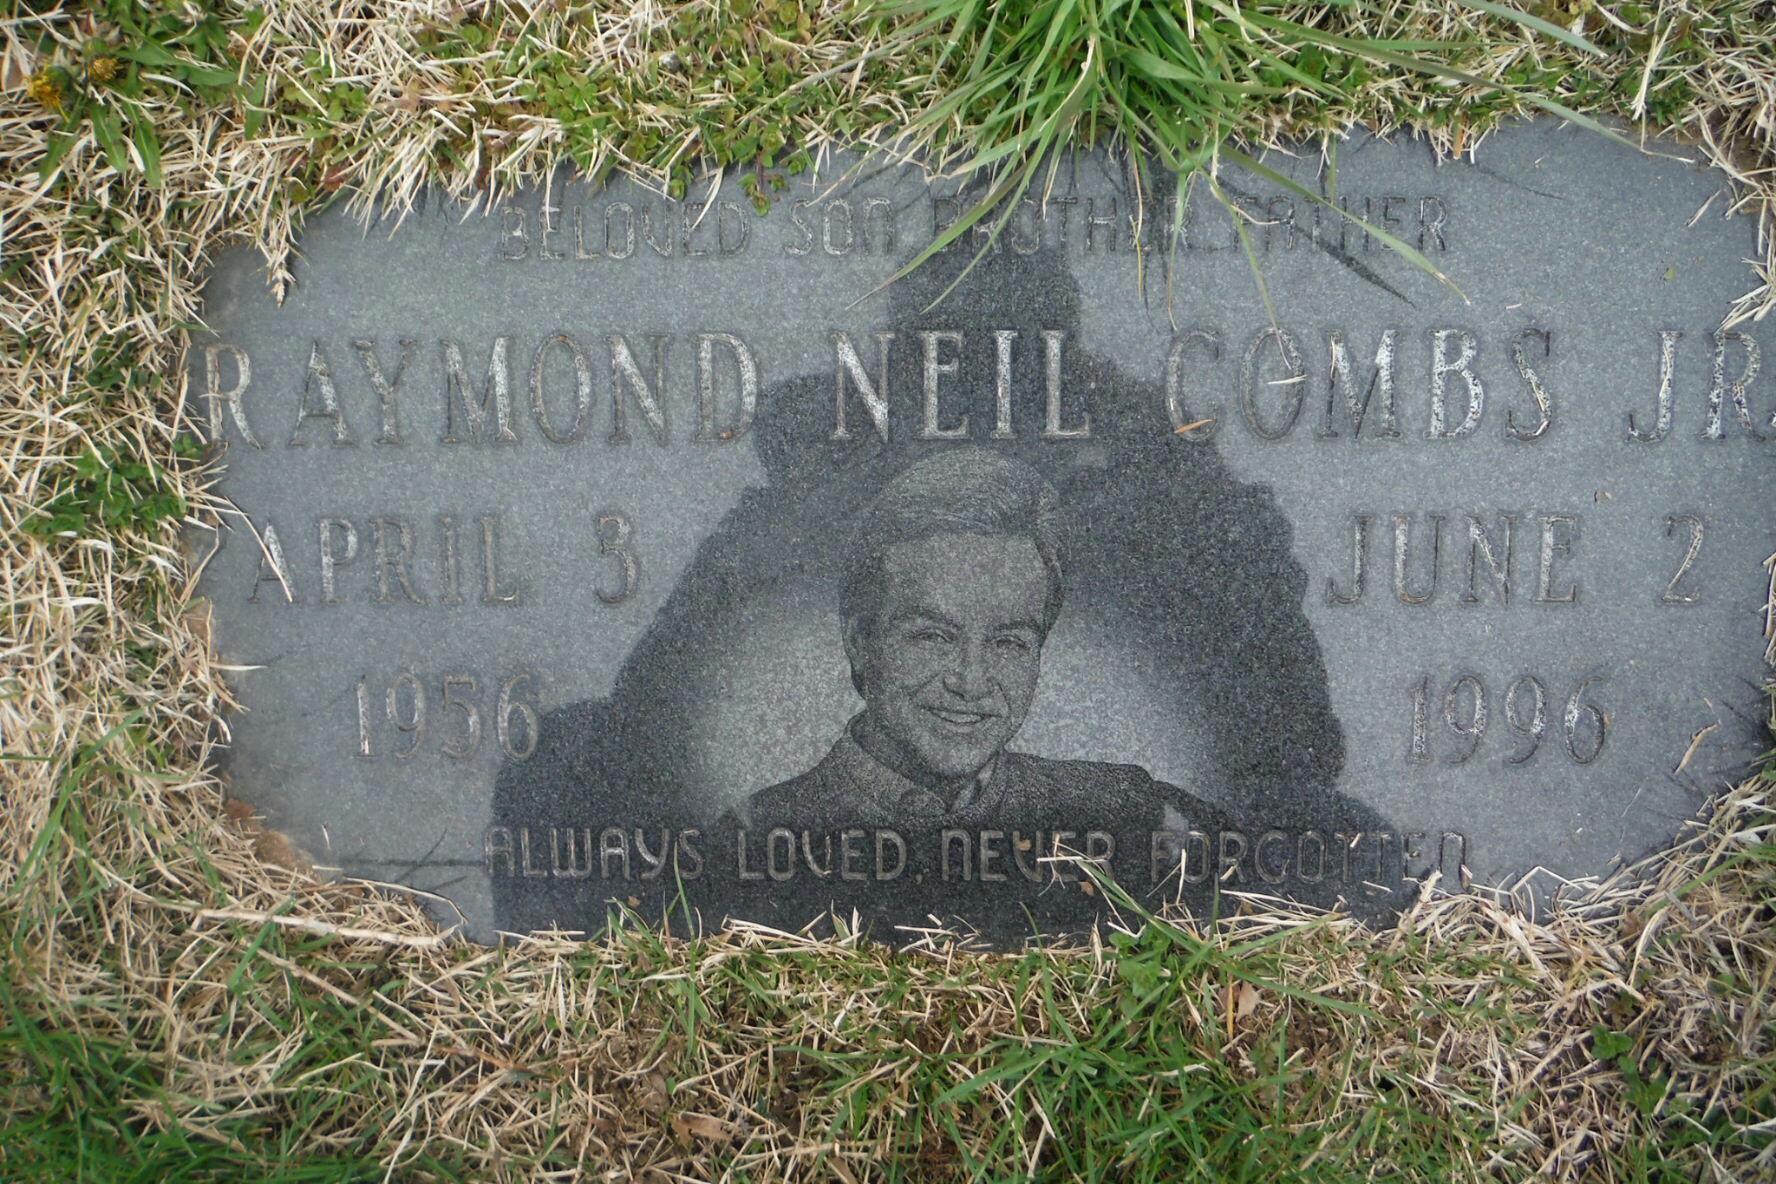 Raymond Neil Ray Combs, Jr